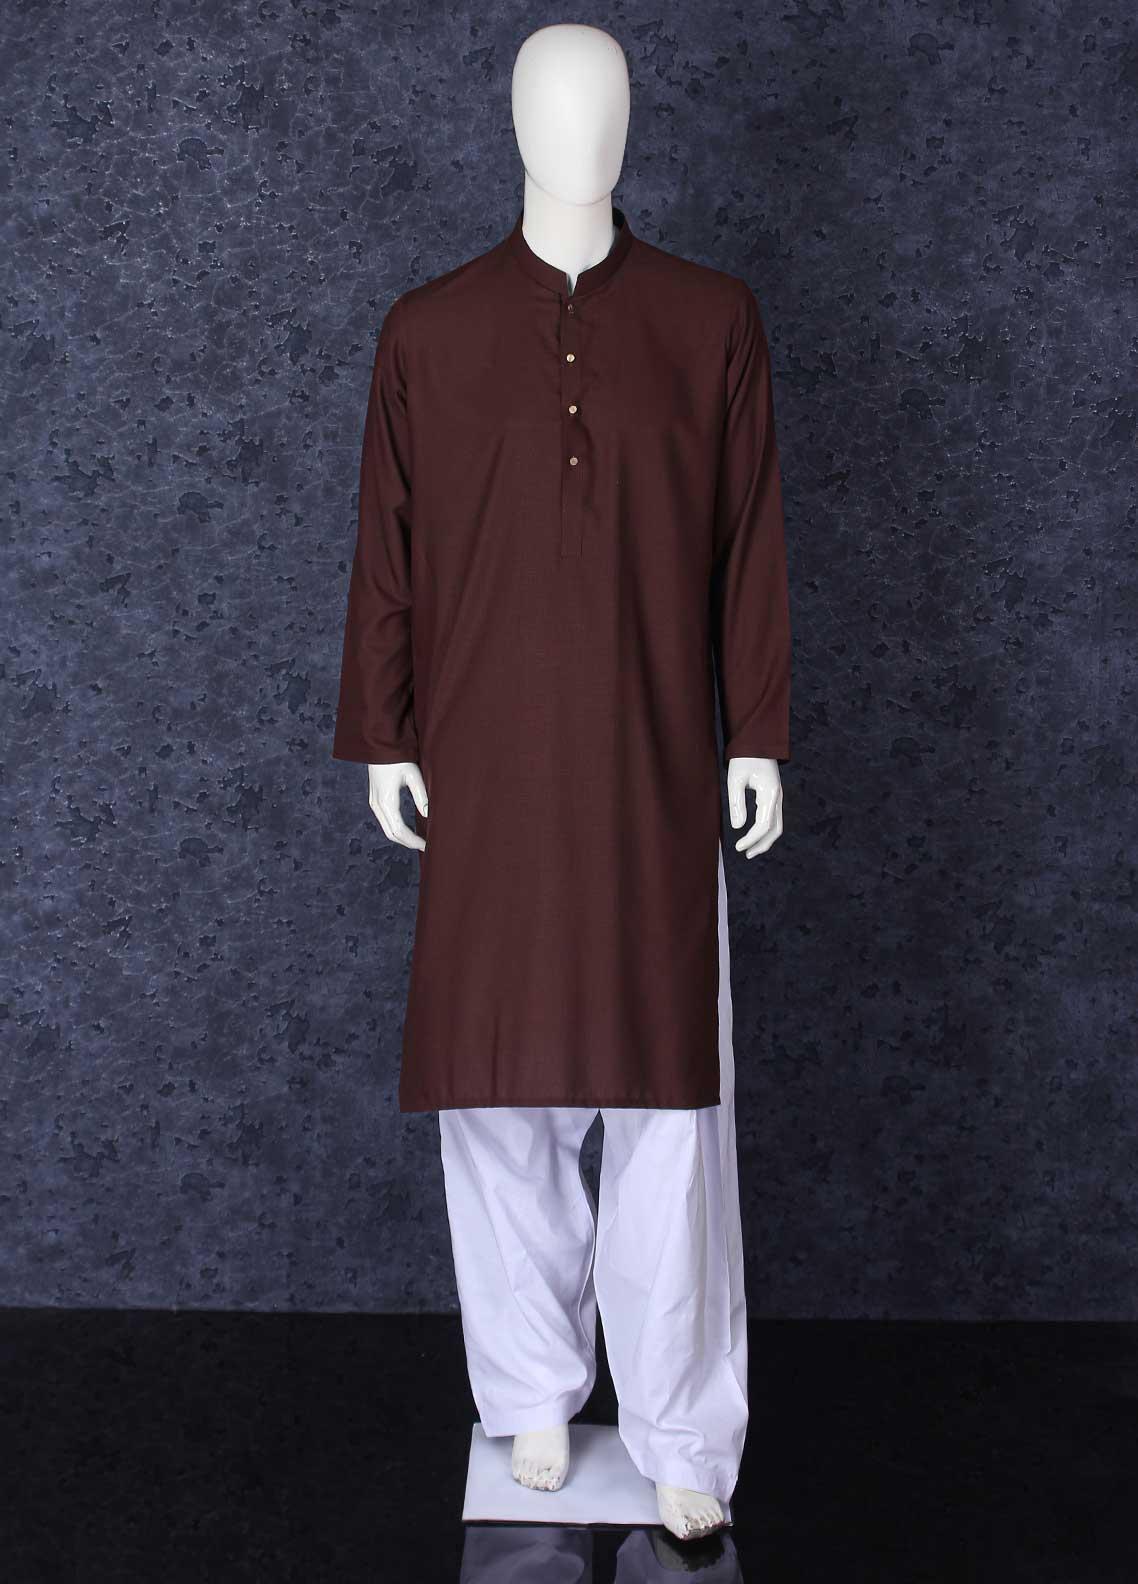 Aizaz Zafar Toyobo Formal Kurta for Men -  301 Brown